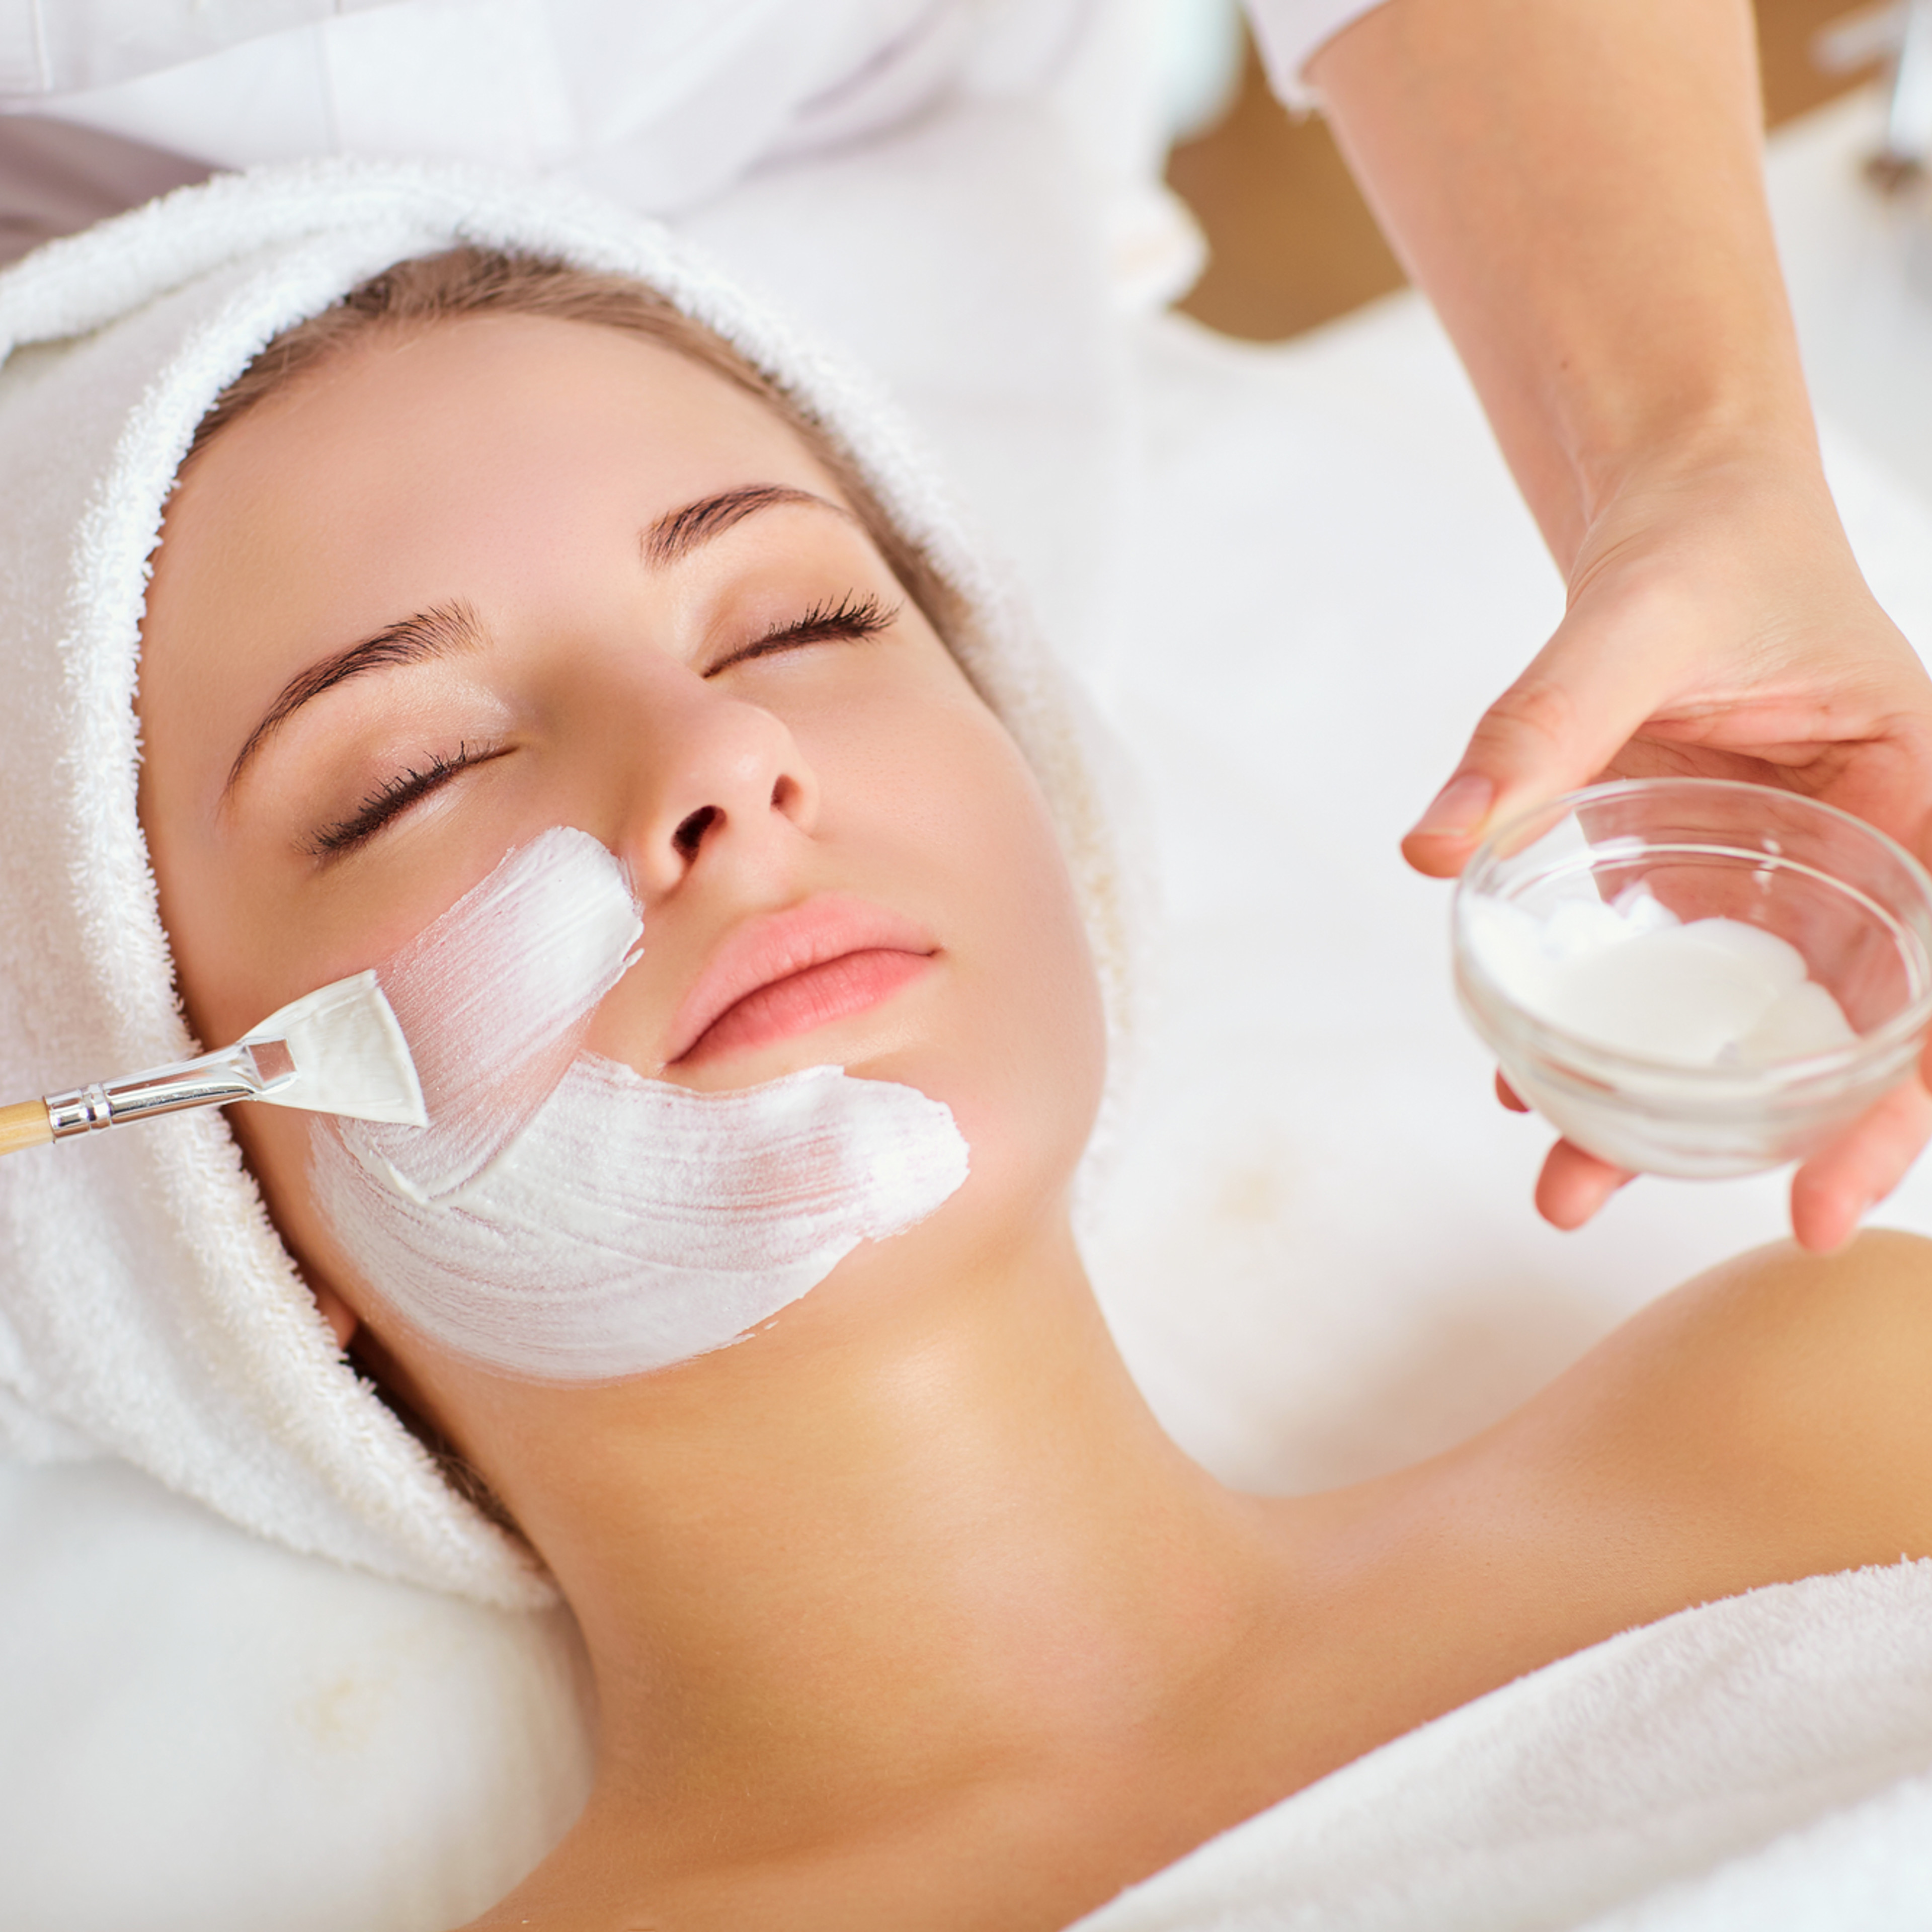 Achtsam Gesichtspflege Behandlung